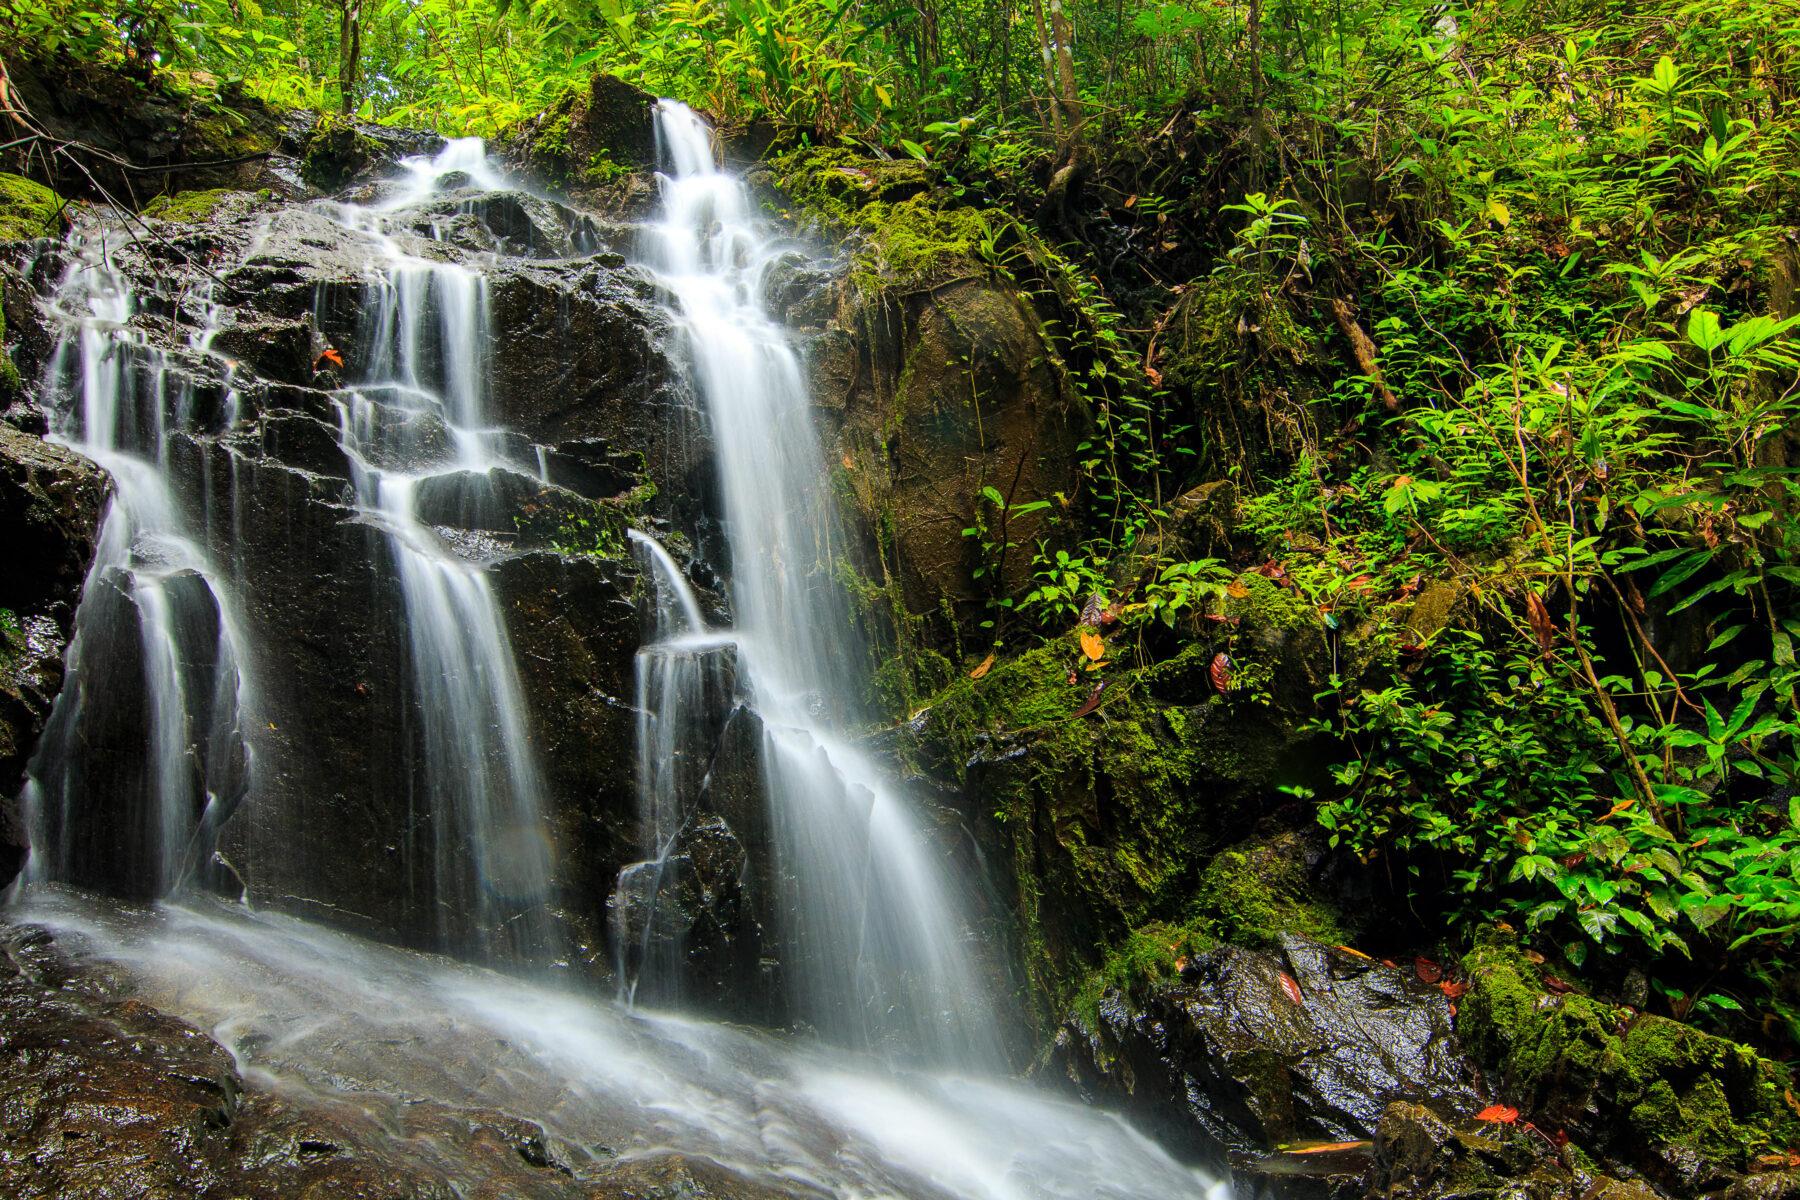 Tonsai Waterfall in Phuket, Thailand